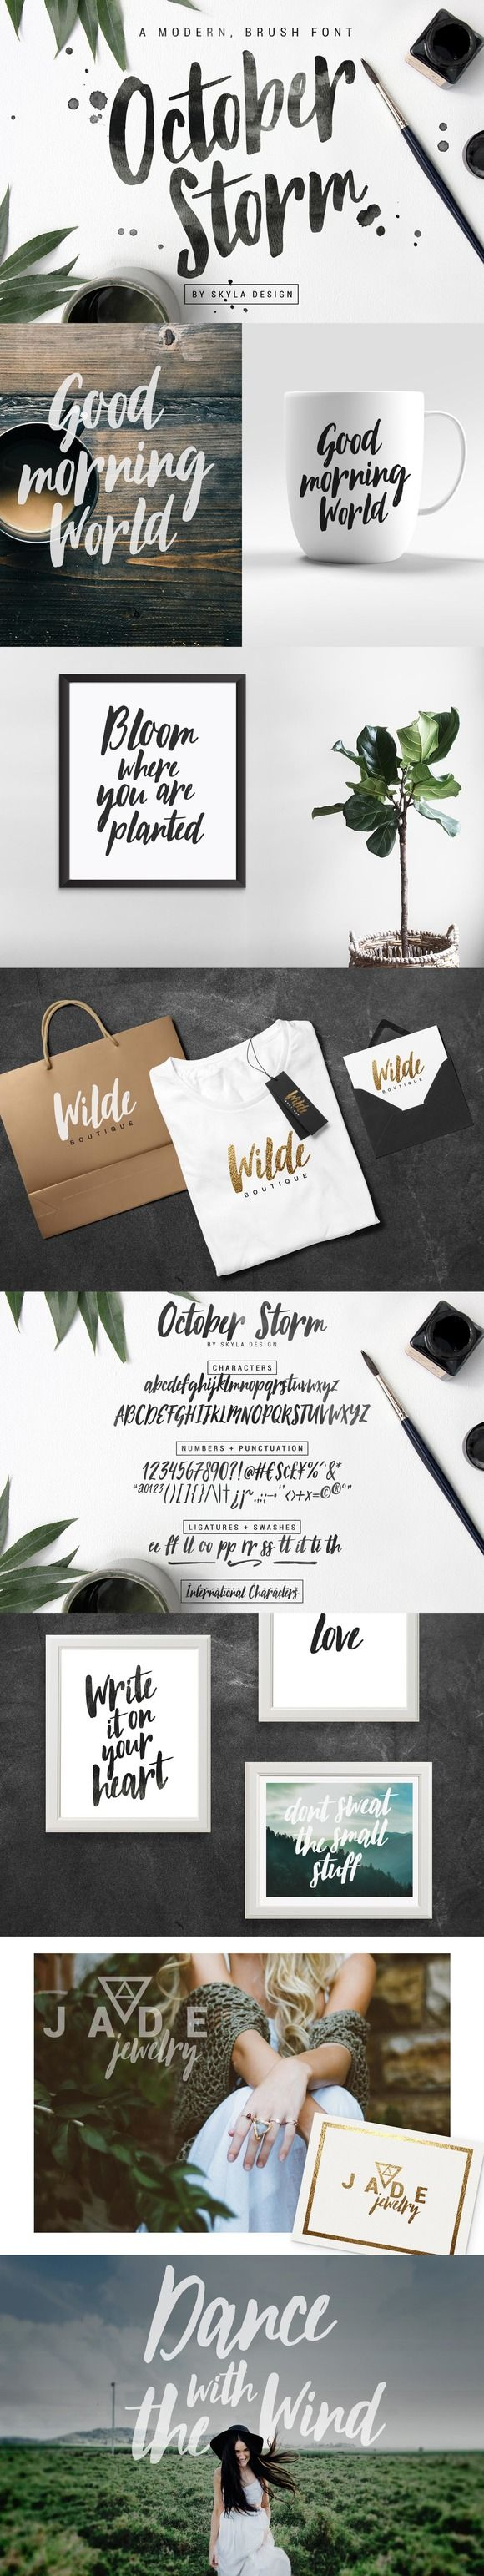 Modern brush font - October Storm by Skyla Design on @creativemarket